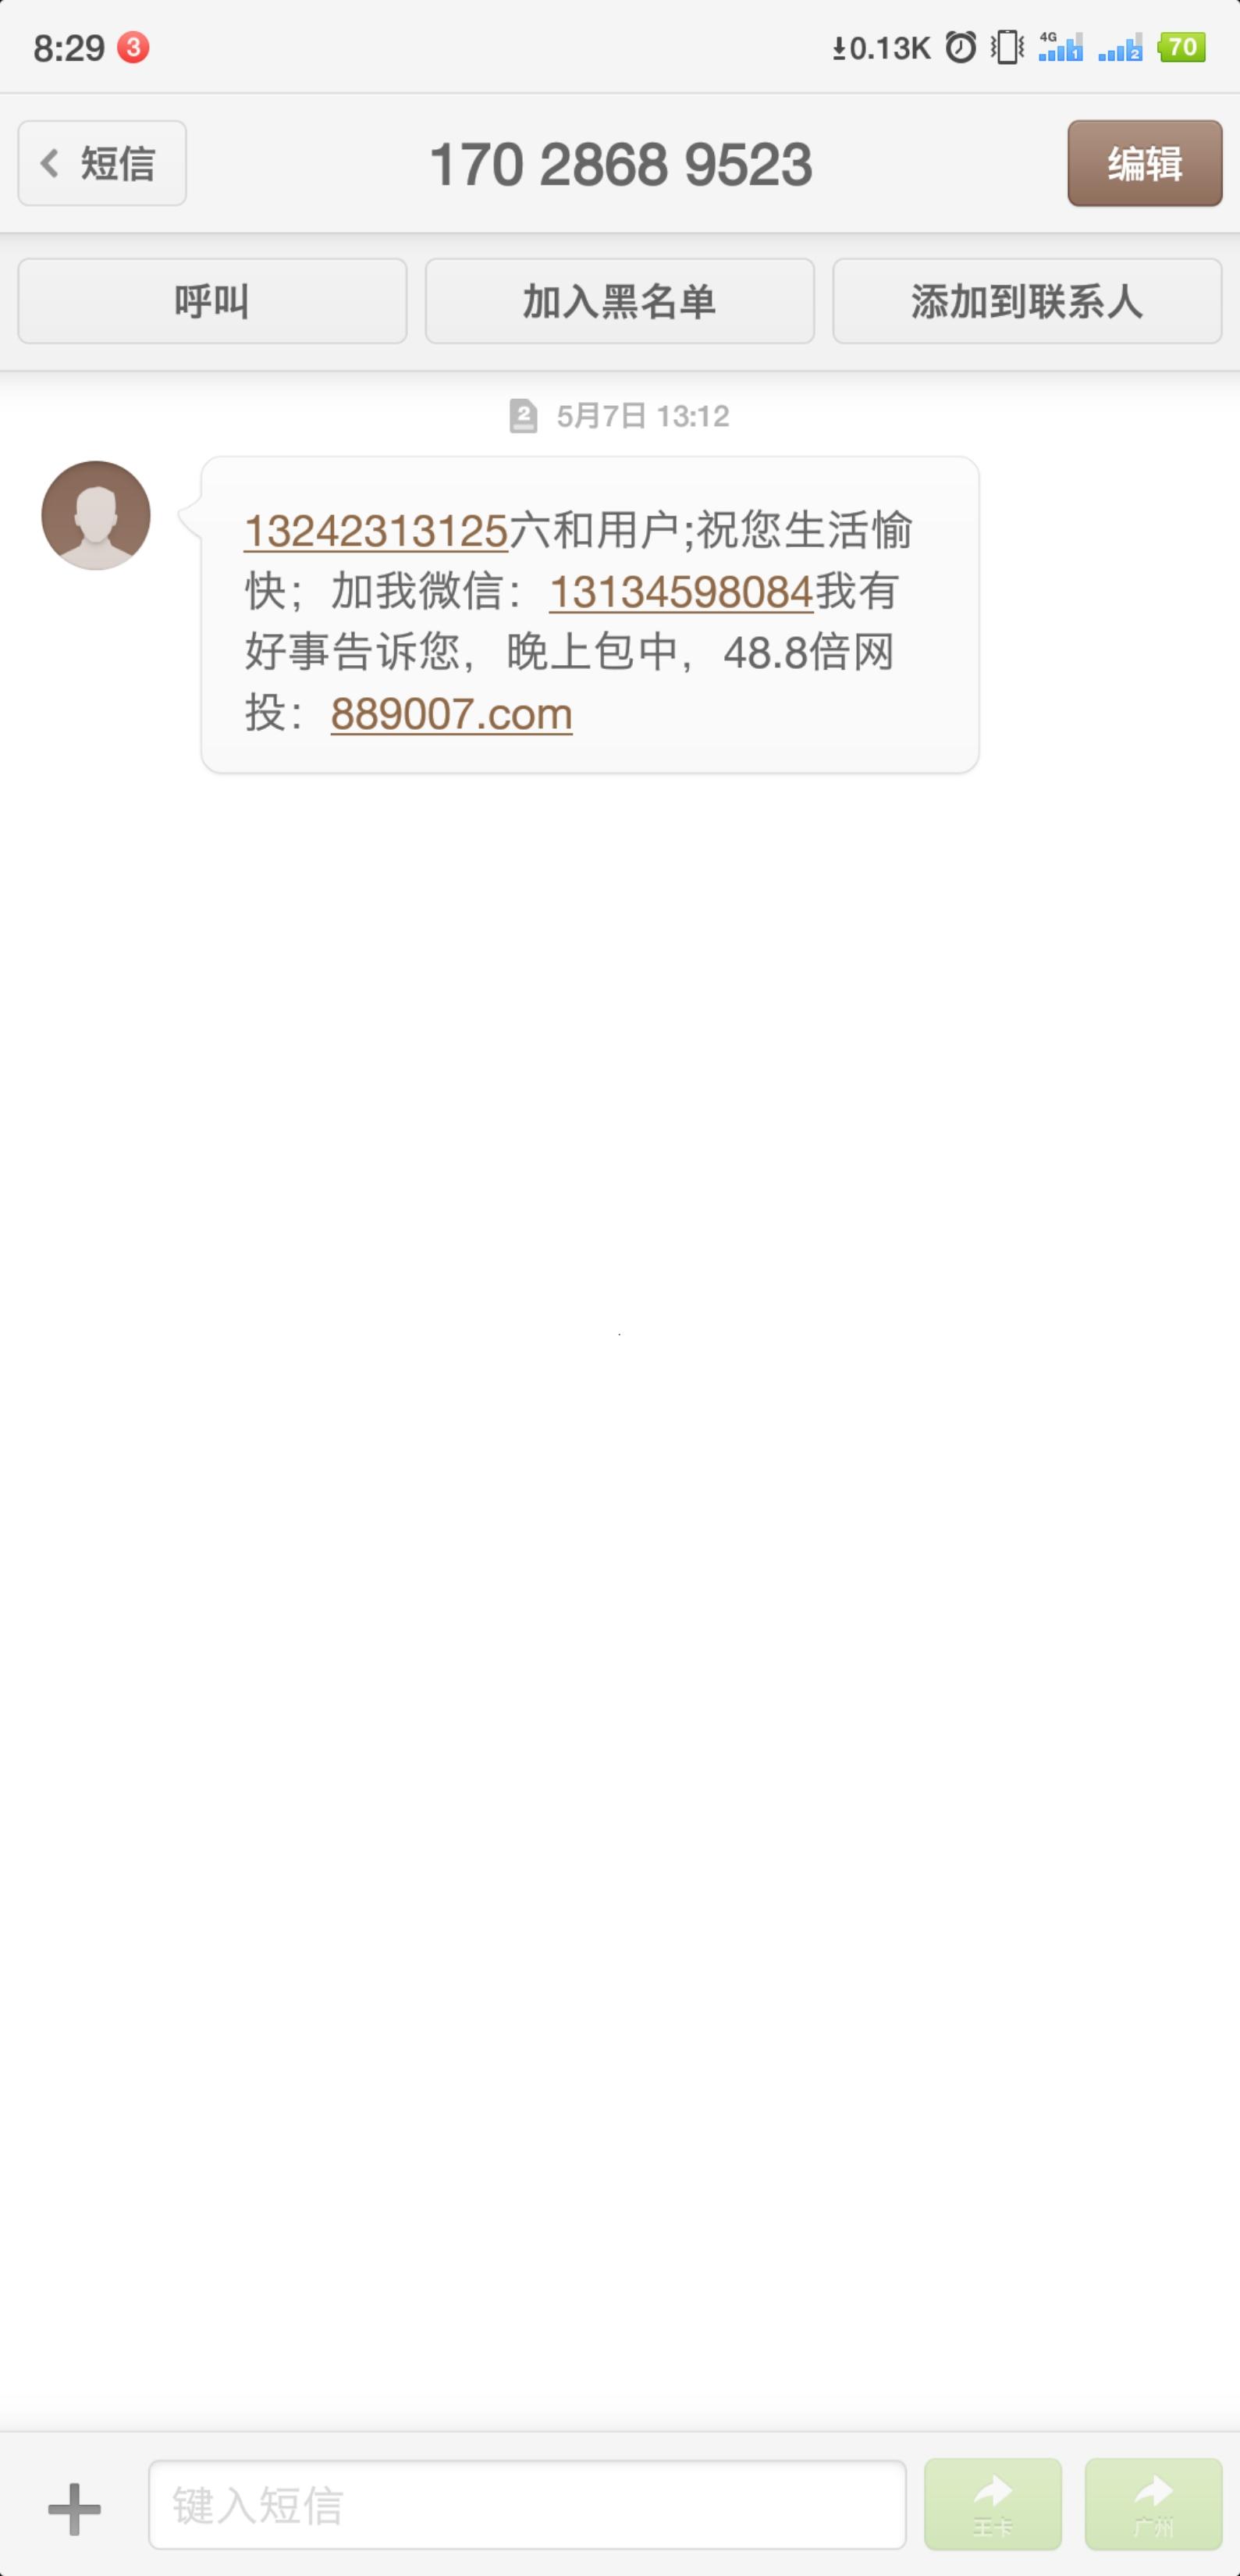 Screenshot_2019-05-16-08-29-58-269_??.png